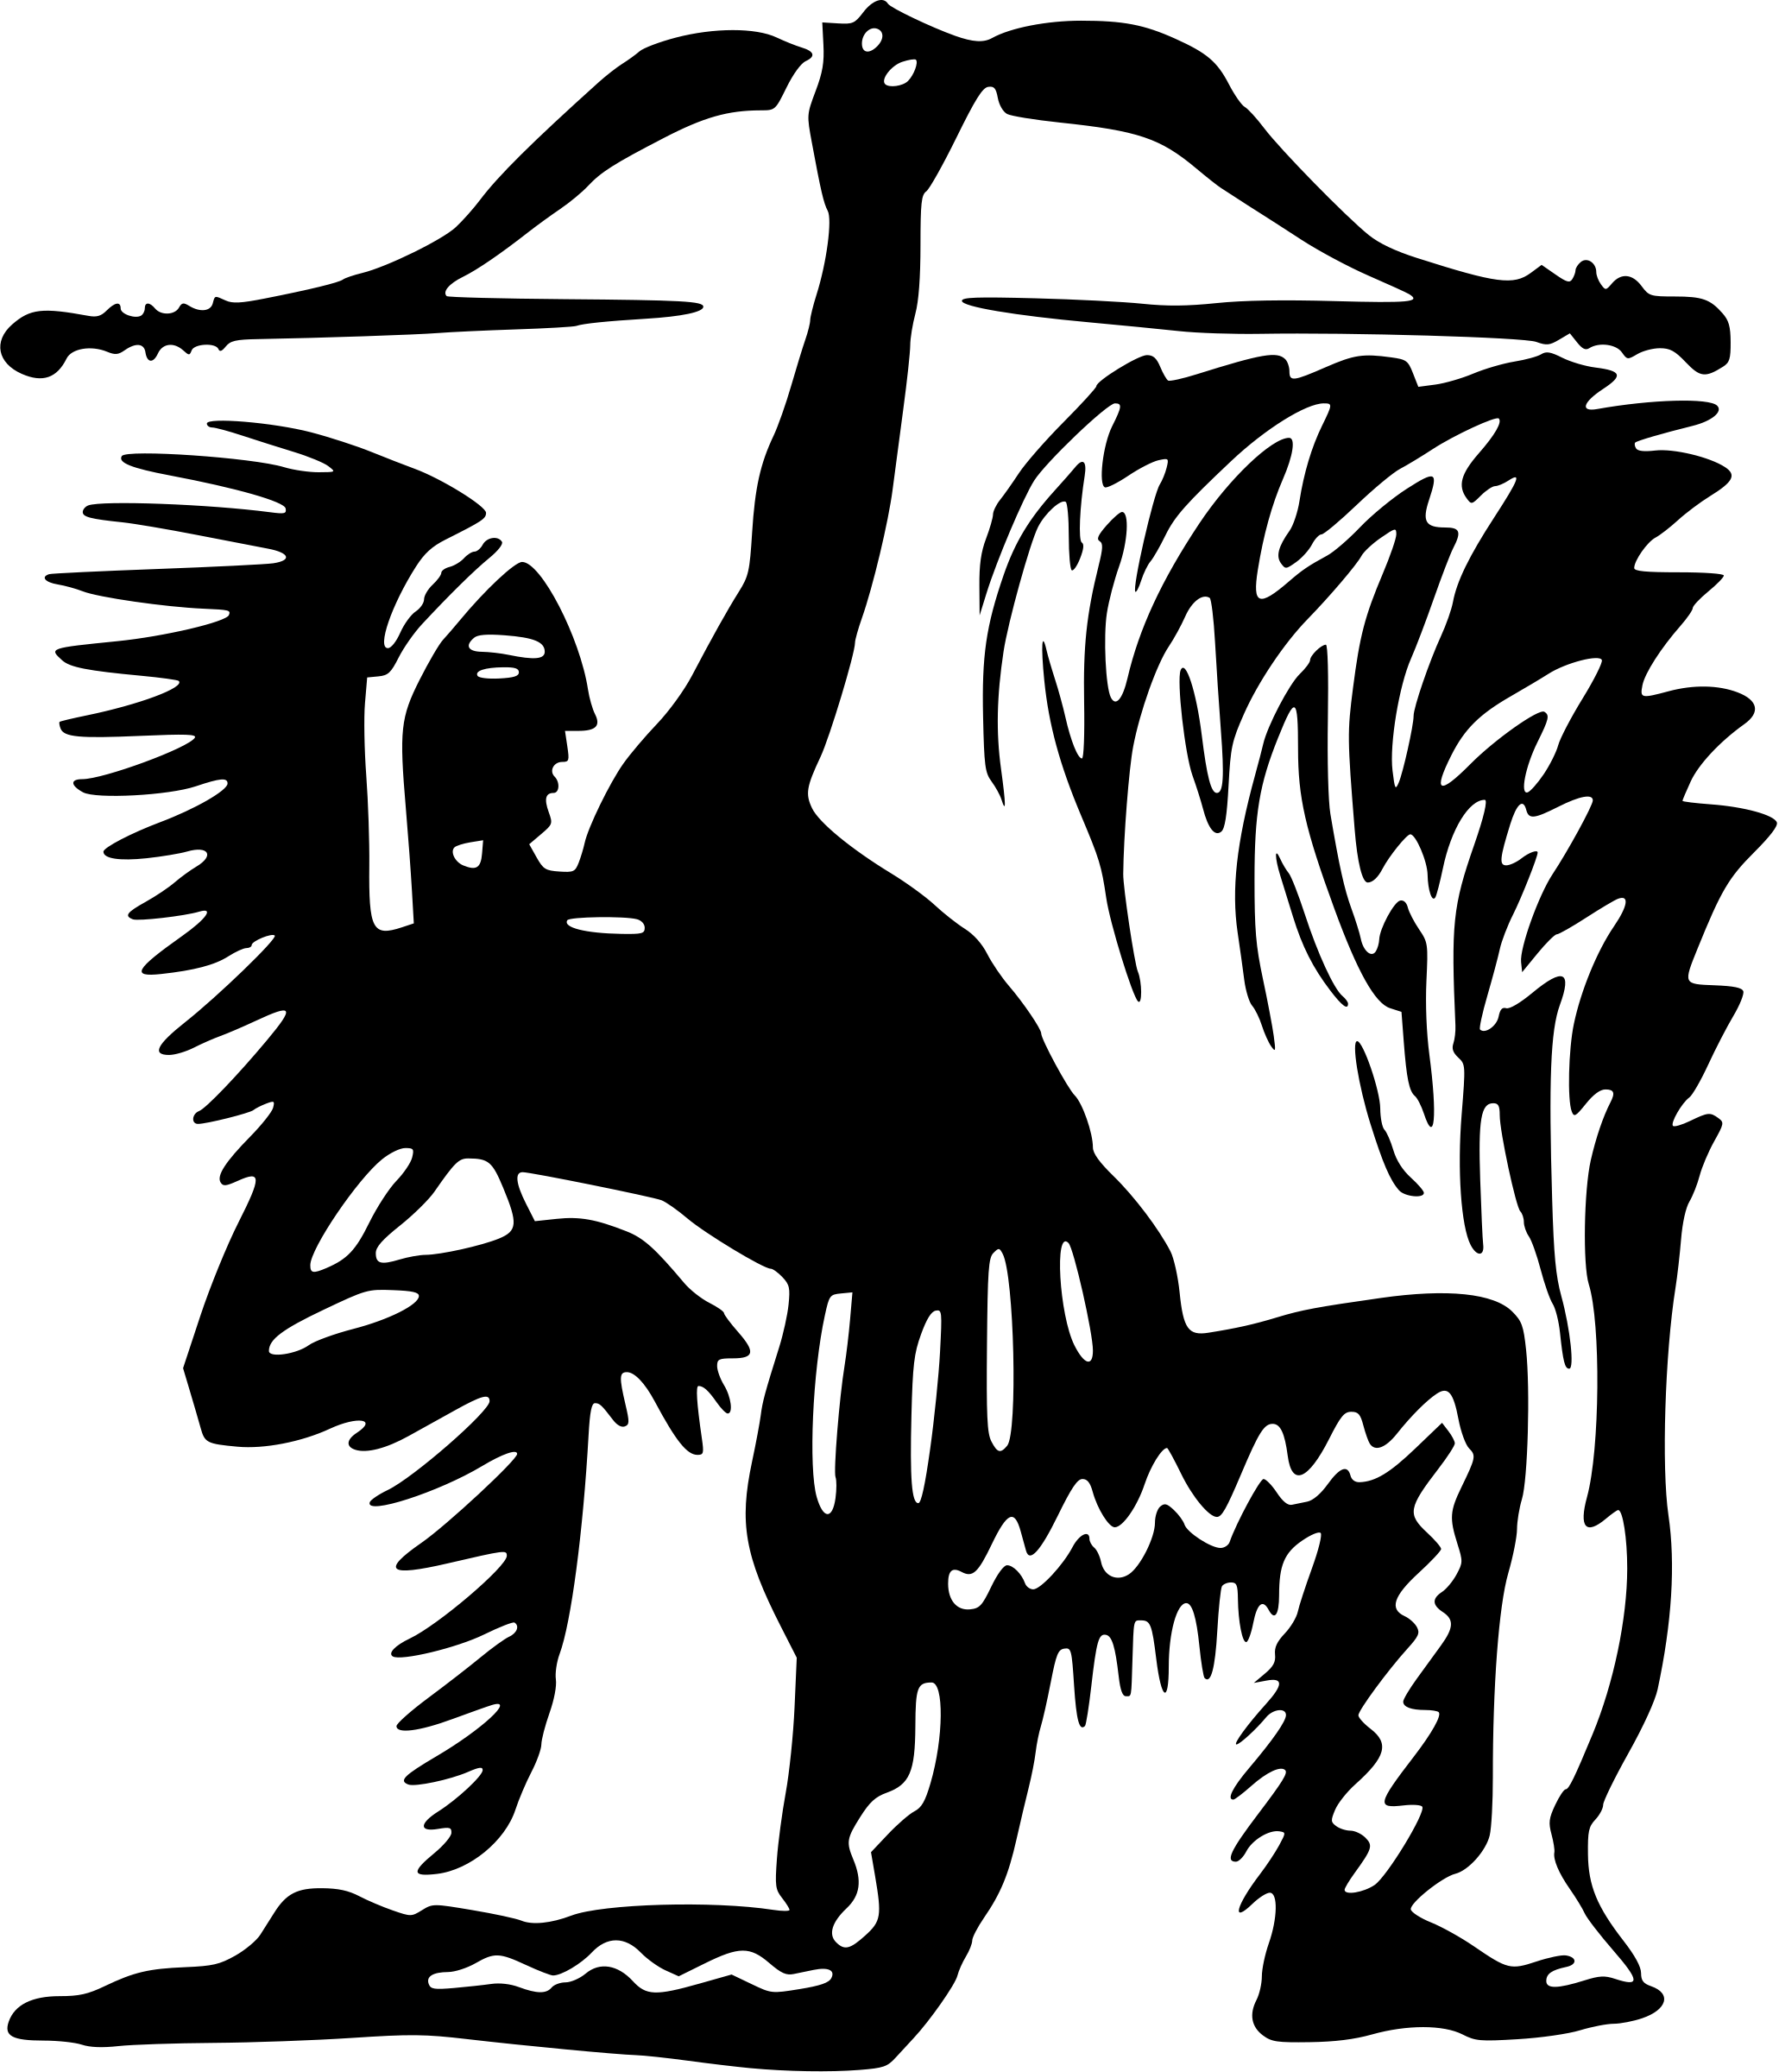 Native American clipart transparent Clipart silhouette Native silhouette Native